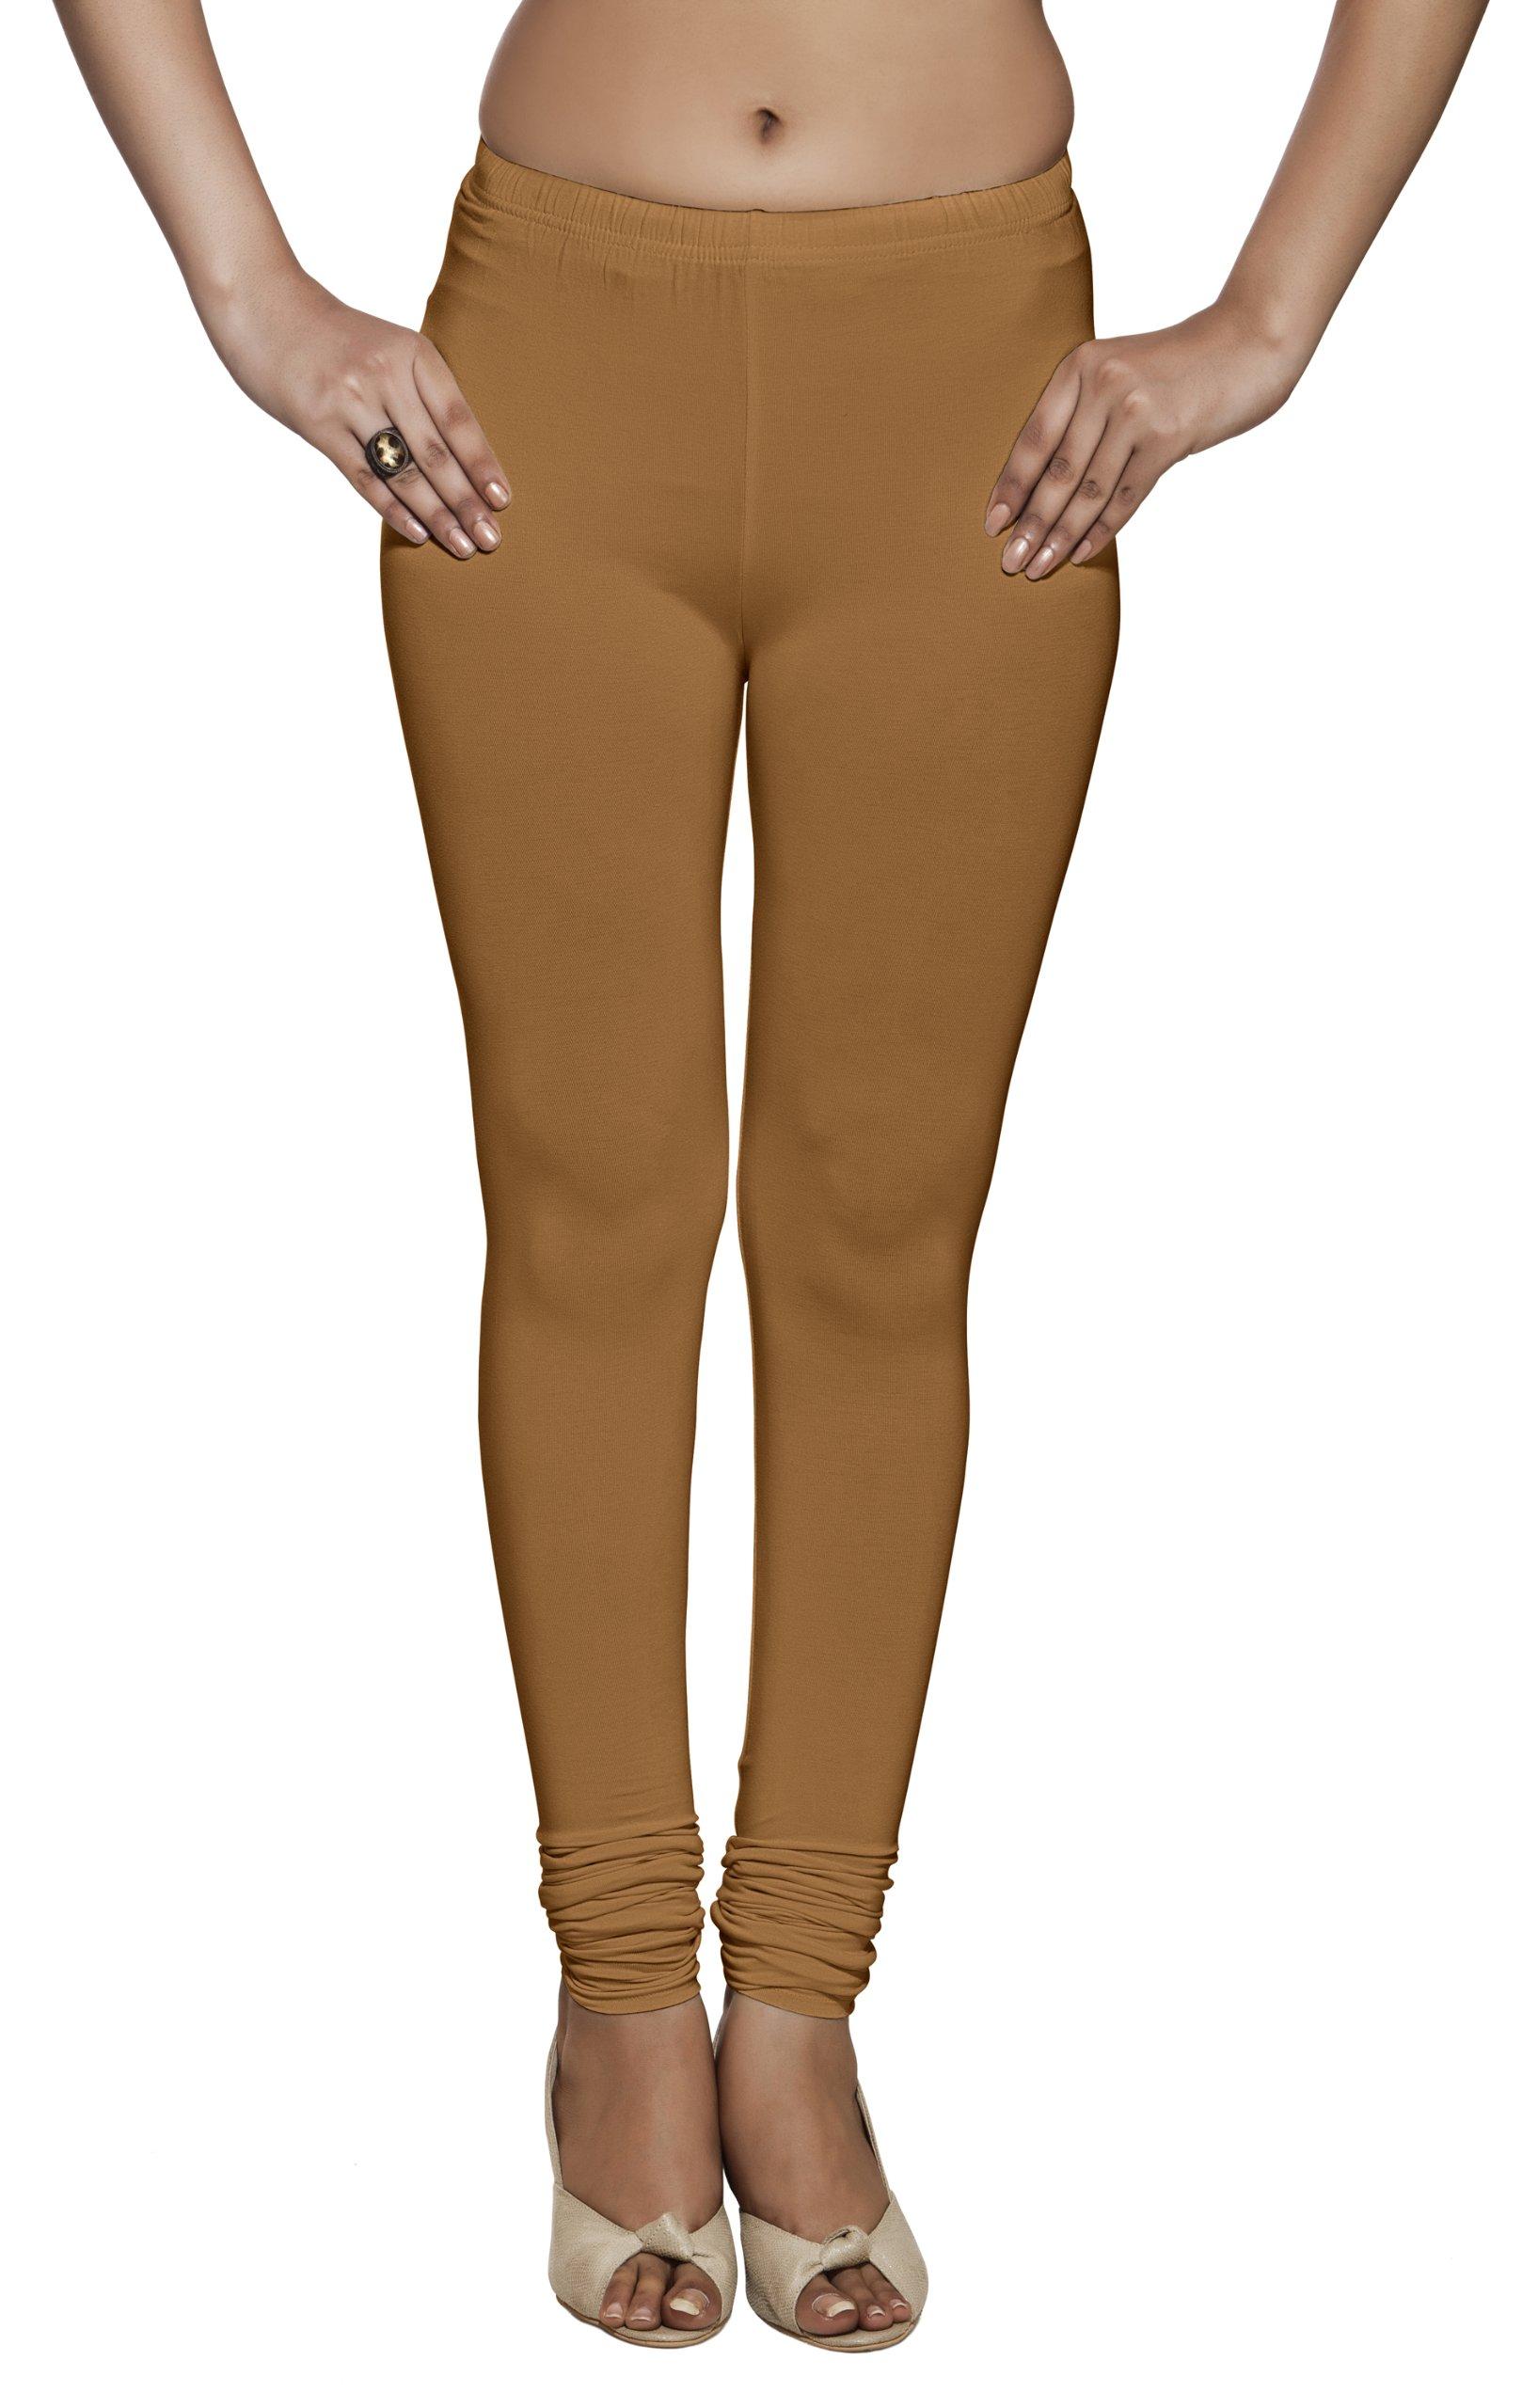 Rangmanch Womens Indian Ethnic Viscose Strech Leggings Pants Bottomwear Ochre Large